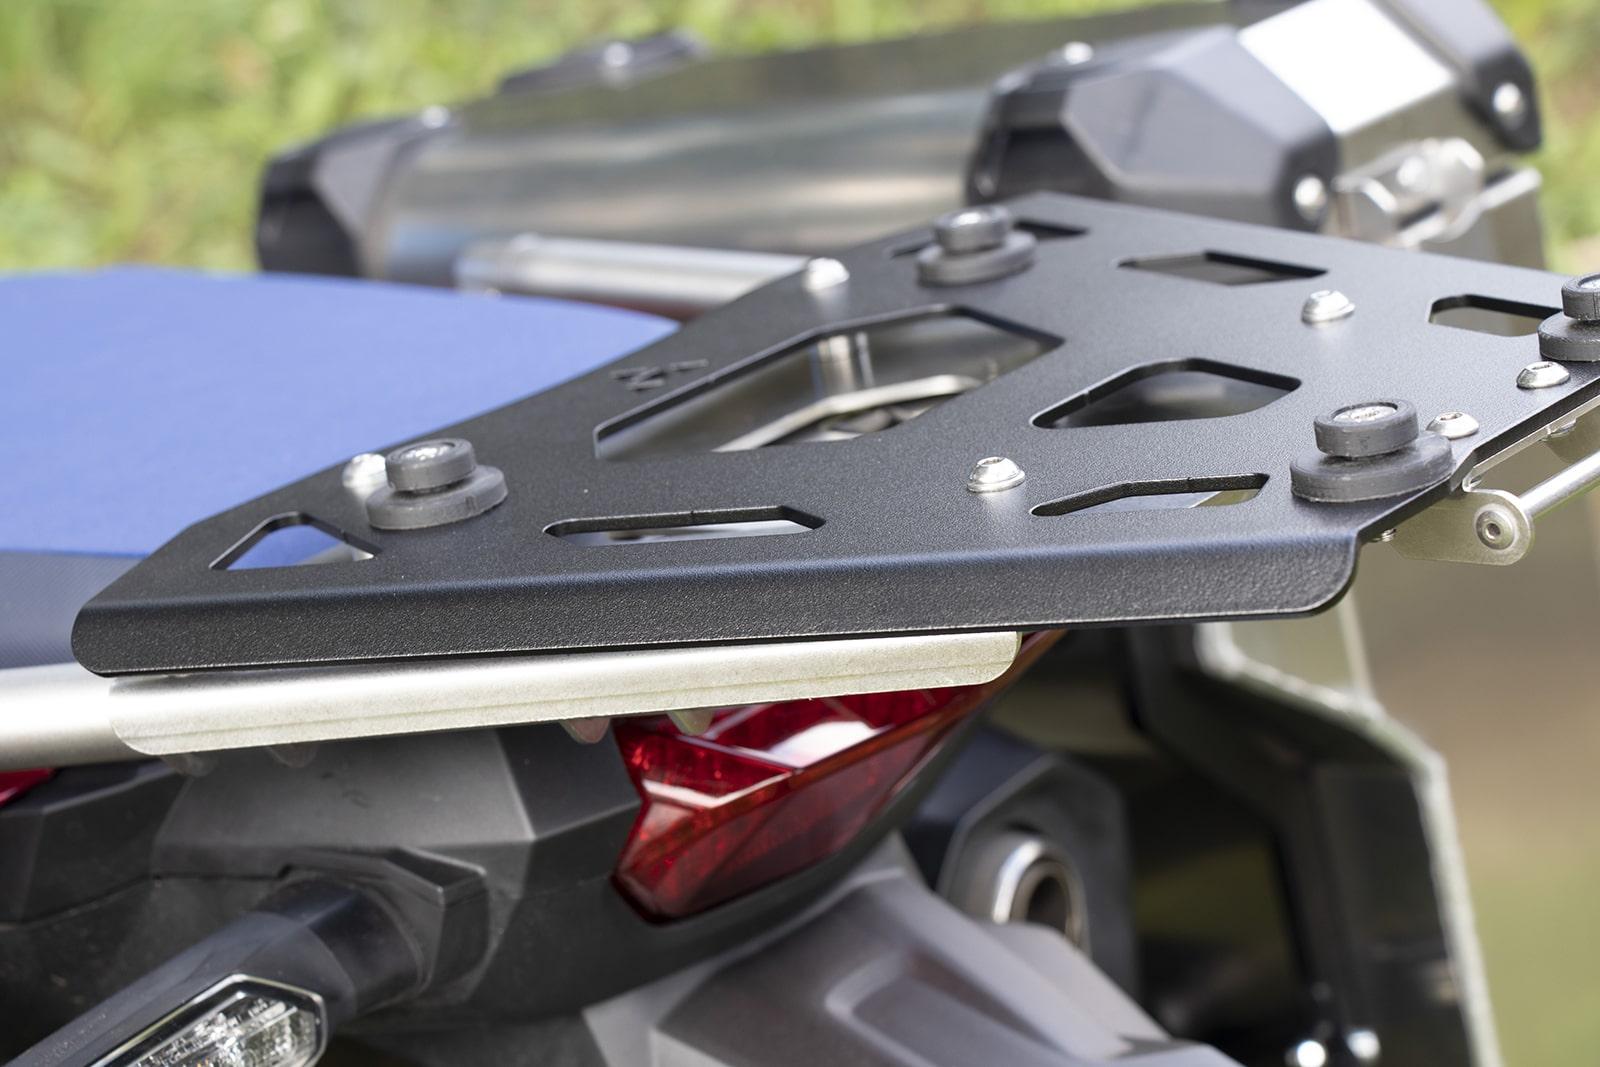 EVO top case mounting plate ATAS